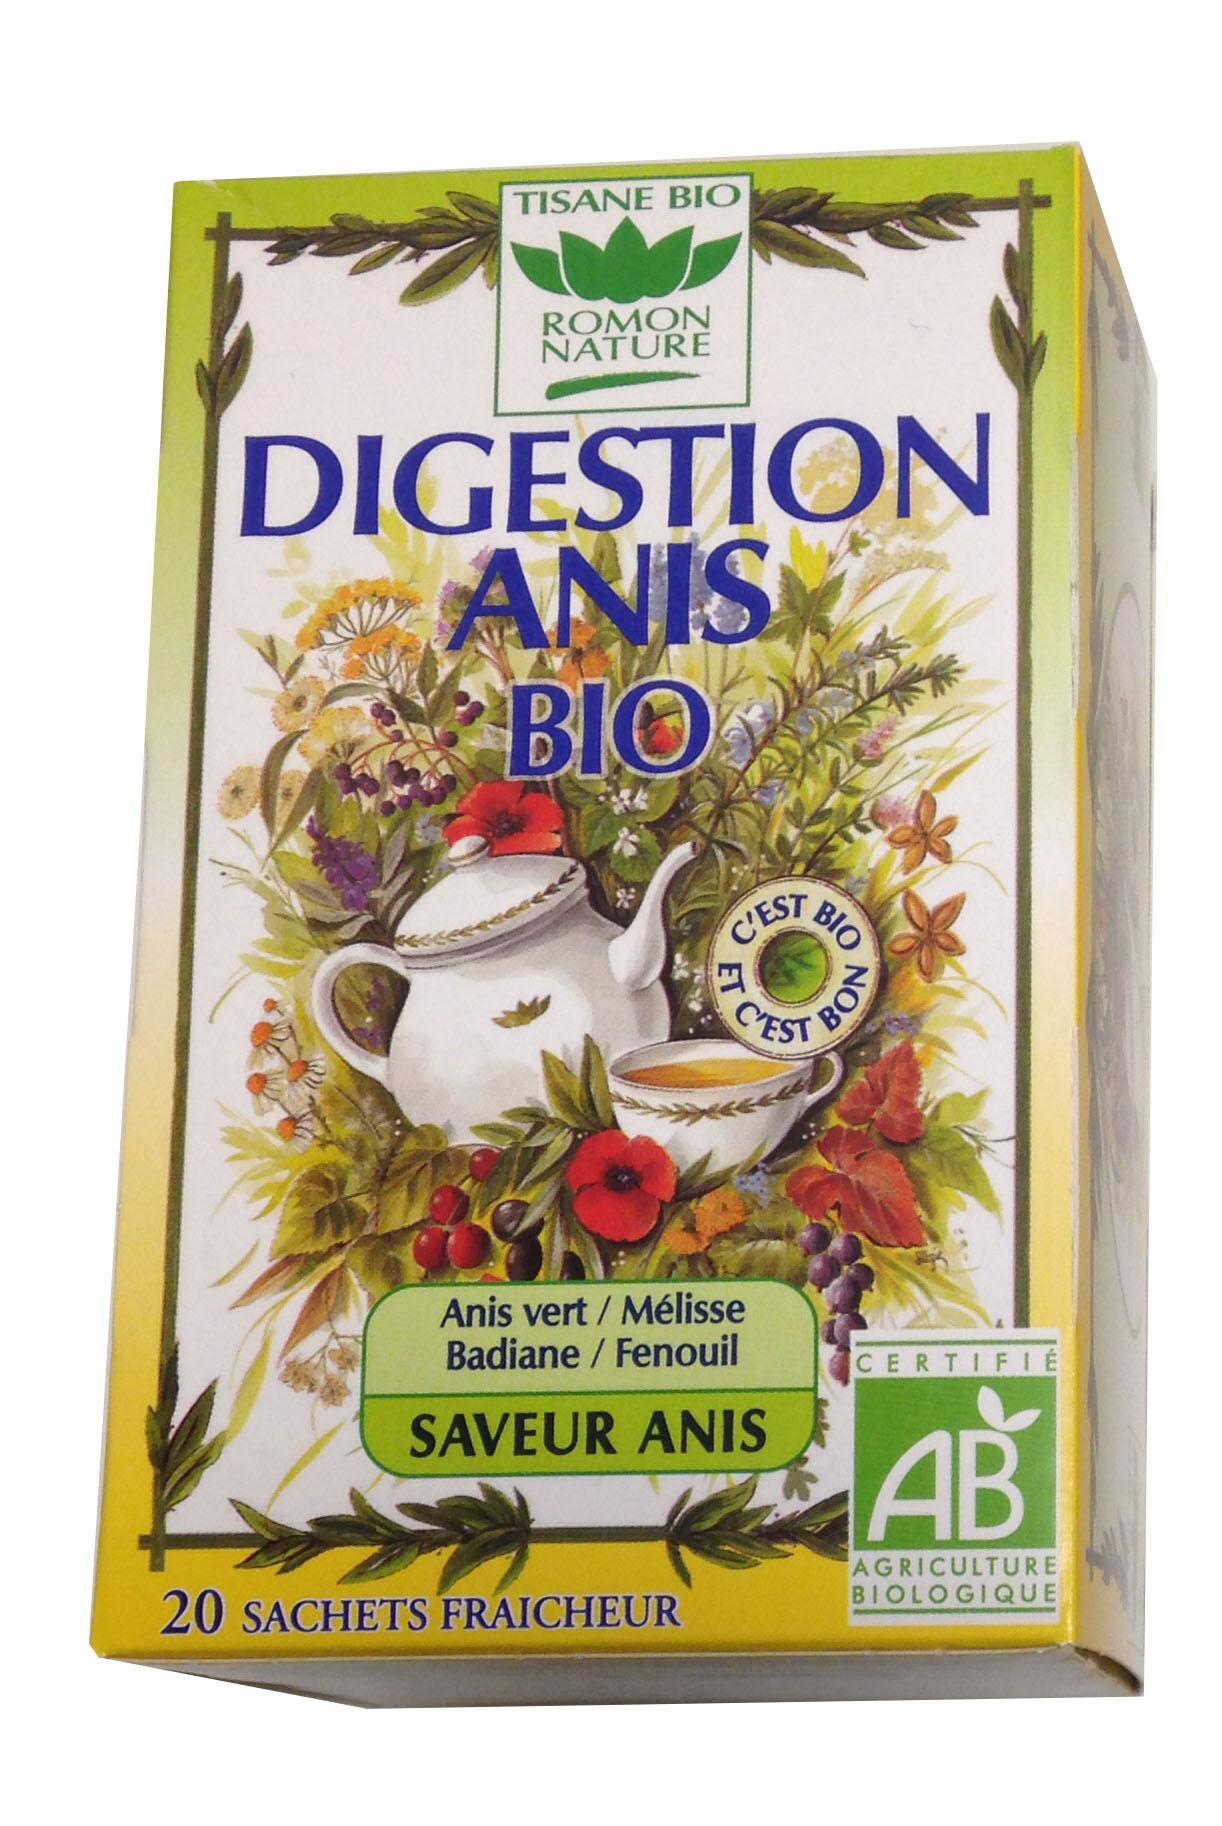 tisane digestion saveur anis biocoop toulouse. Black Bedroom Furniture Sets. Home Design Ideas